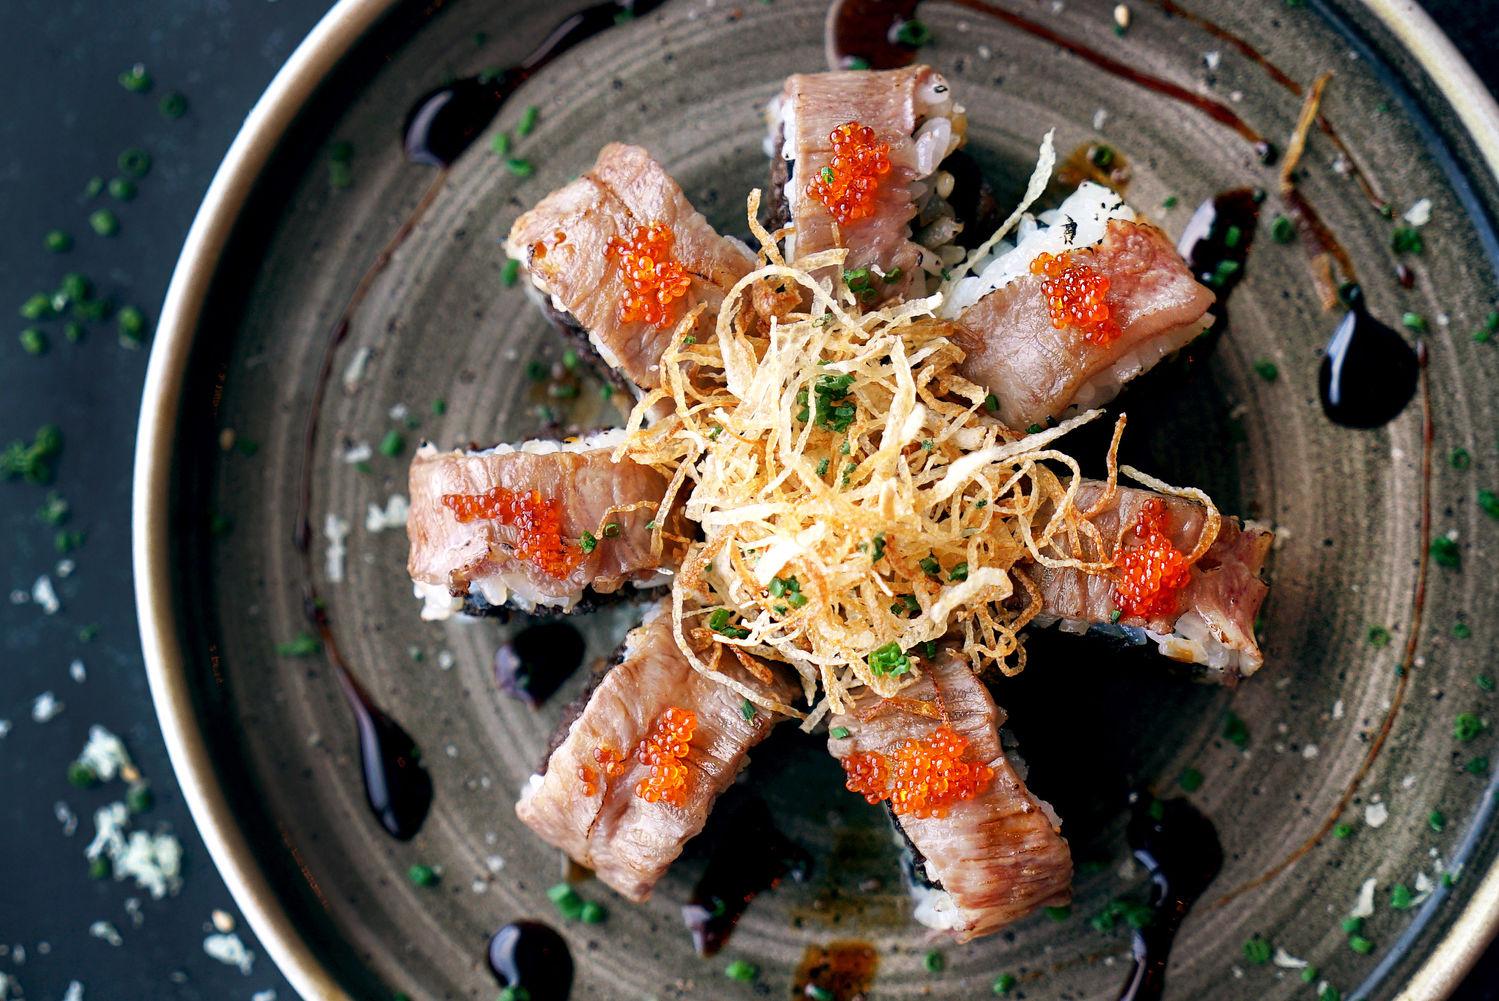 Kinki Restaurant Bar Cowabunga - THE EDGE SINGAPORE